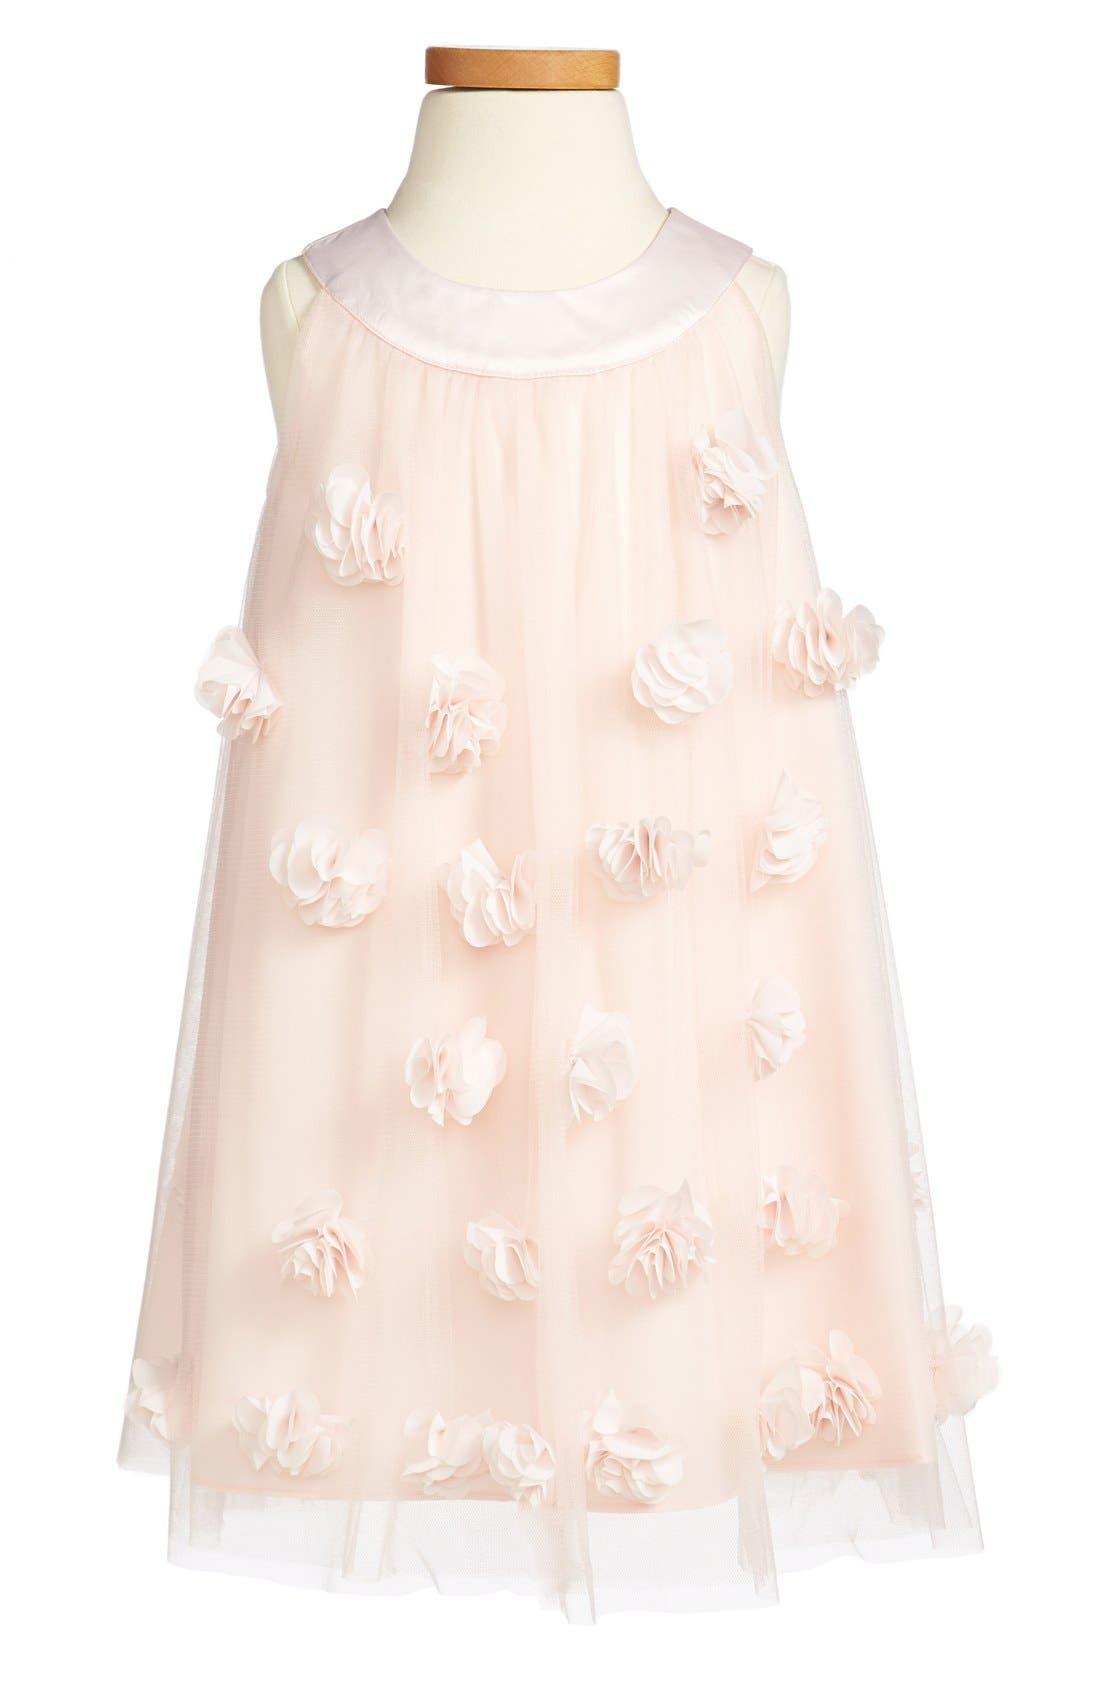 Main Image - Us Angels Embellished Dress (Baby Girls & Toddler Girls) (Online Only)